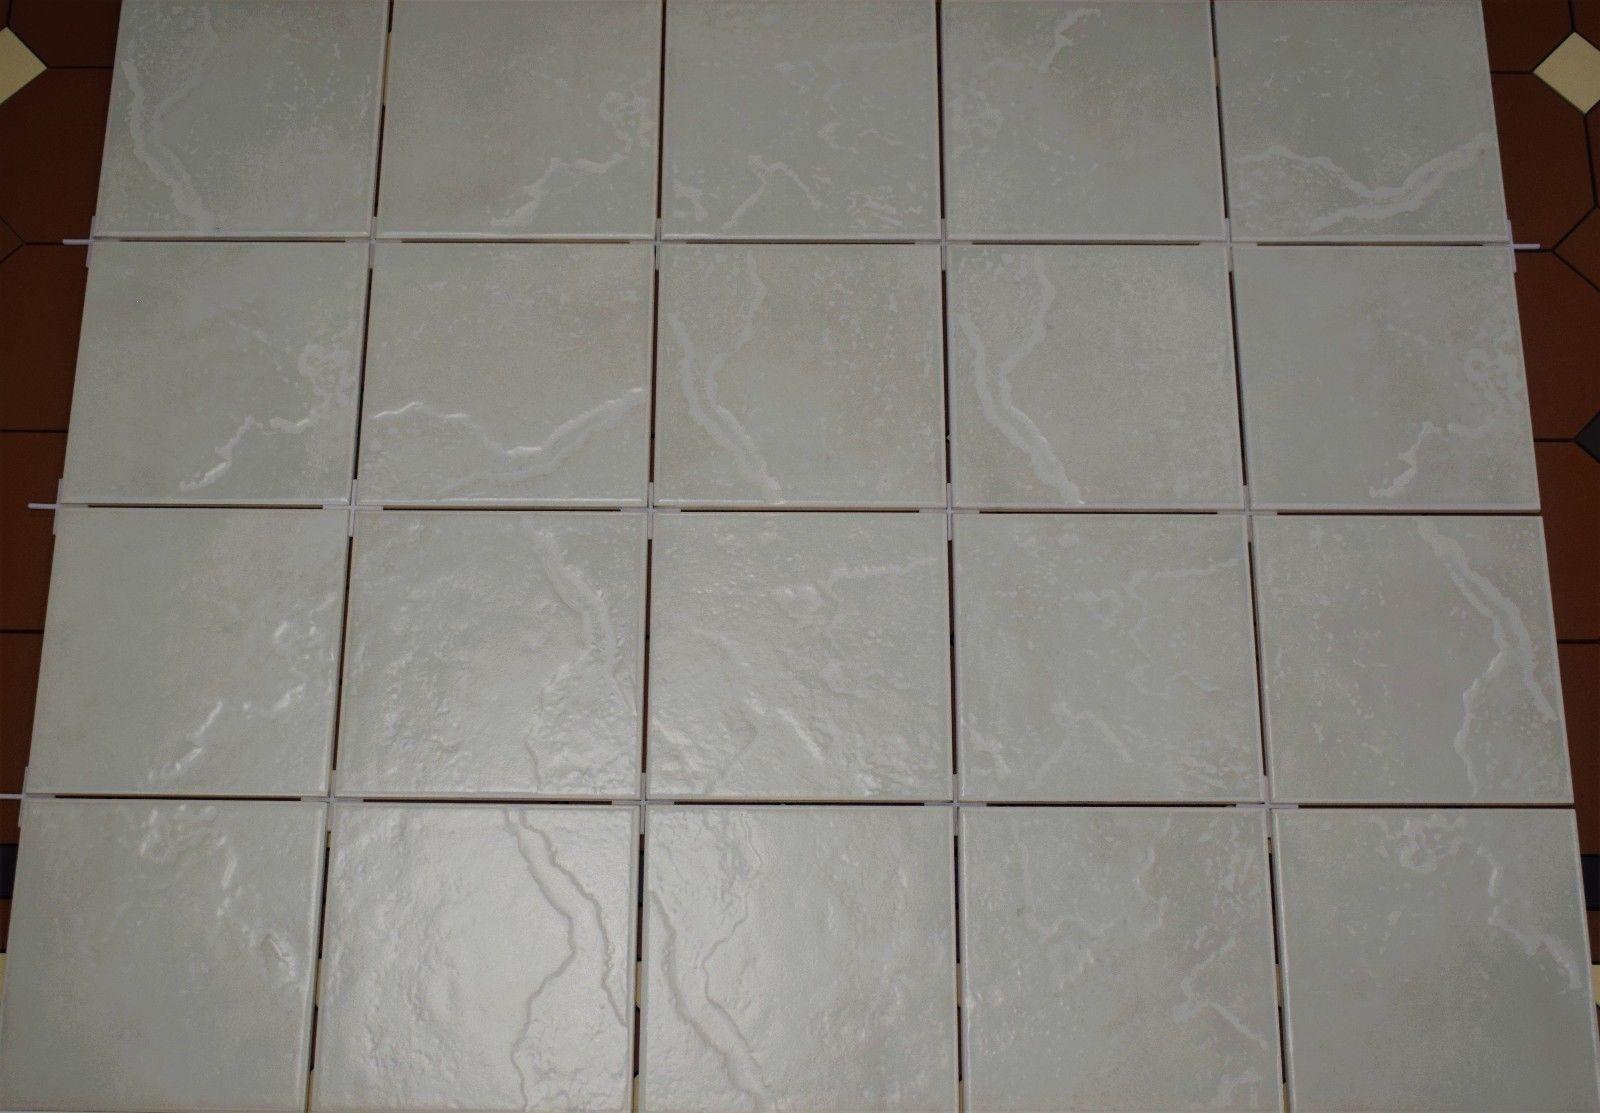 Johnsons DUNE4A Grey effect Wall Tiles 150x150mm - UK Tile Sales